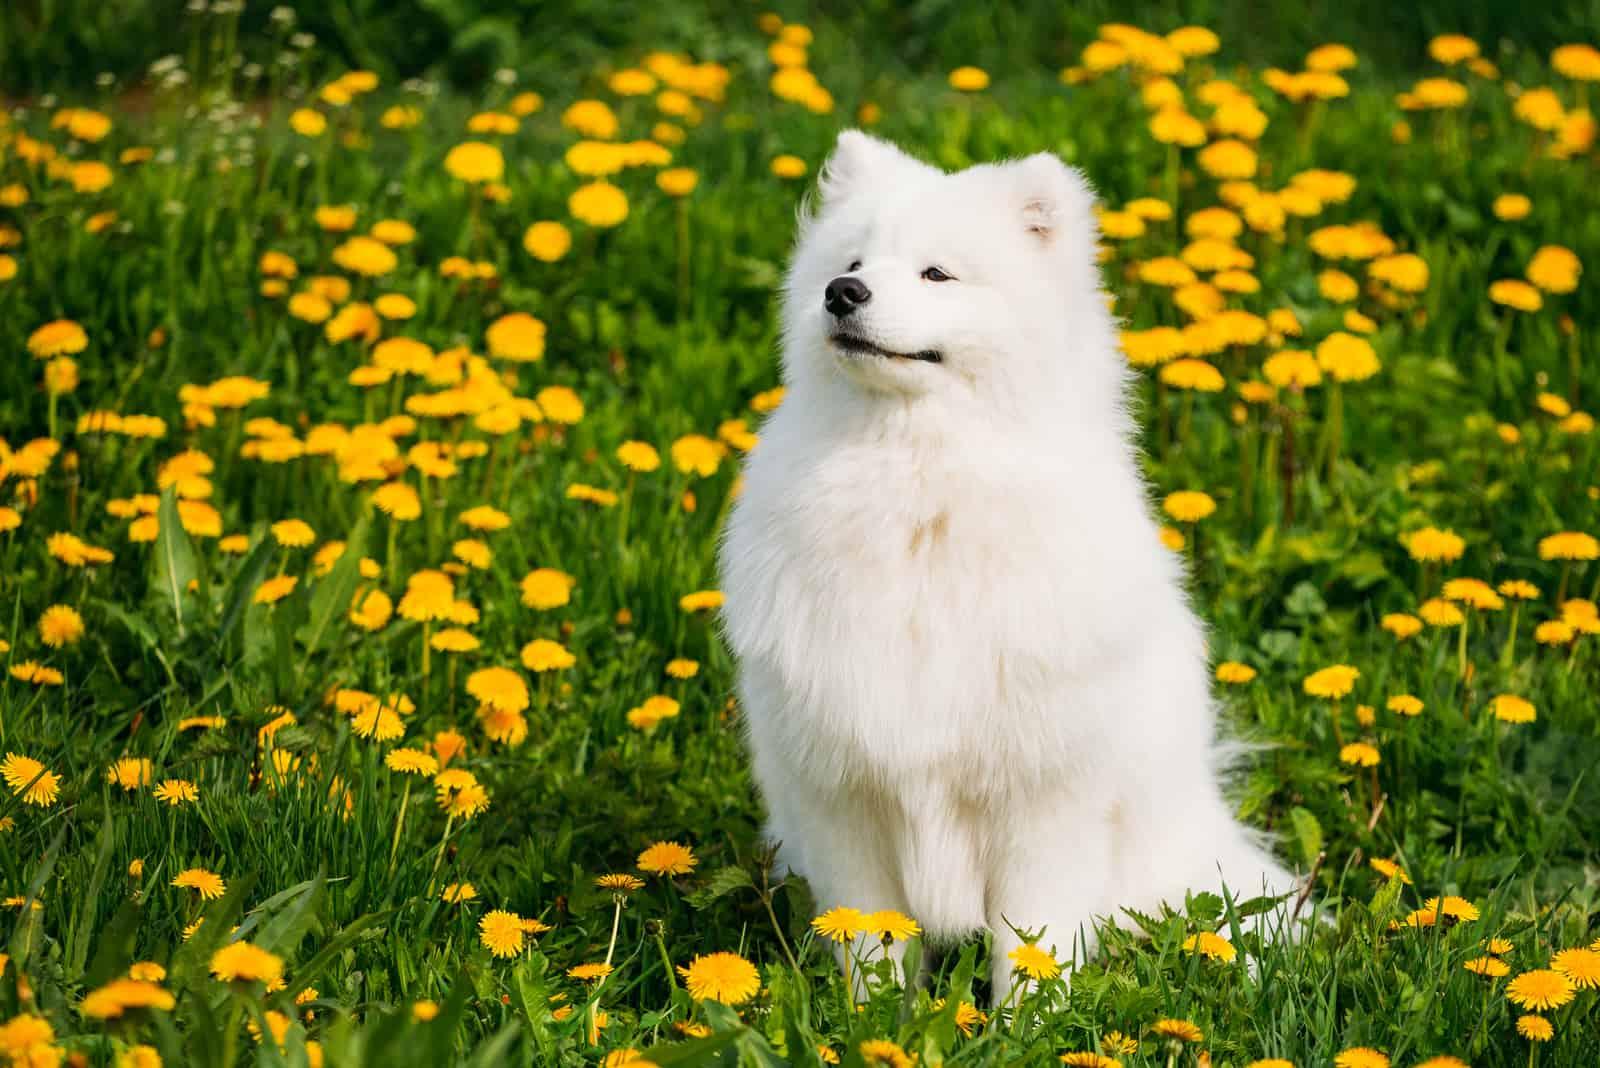 White Samoyed Dog sitting on the grass